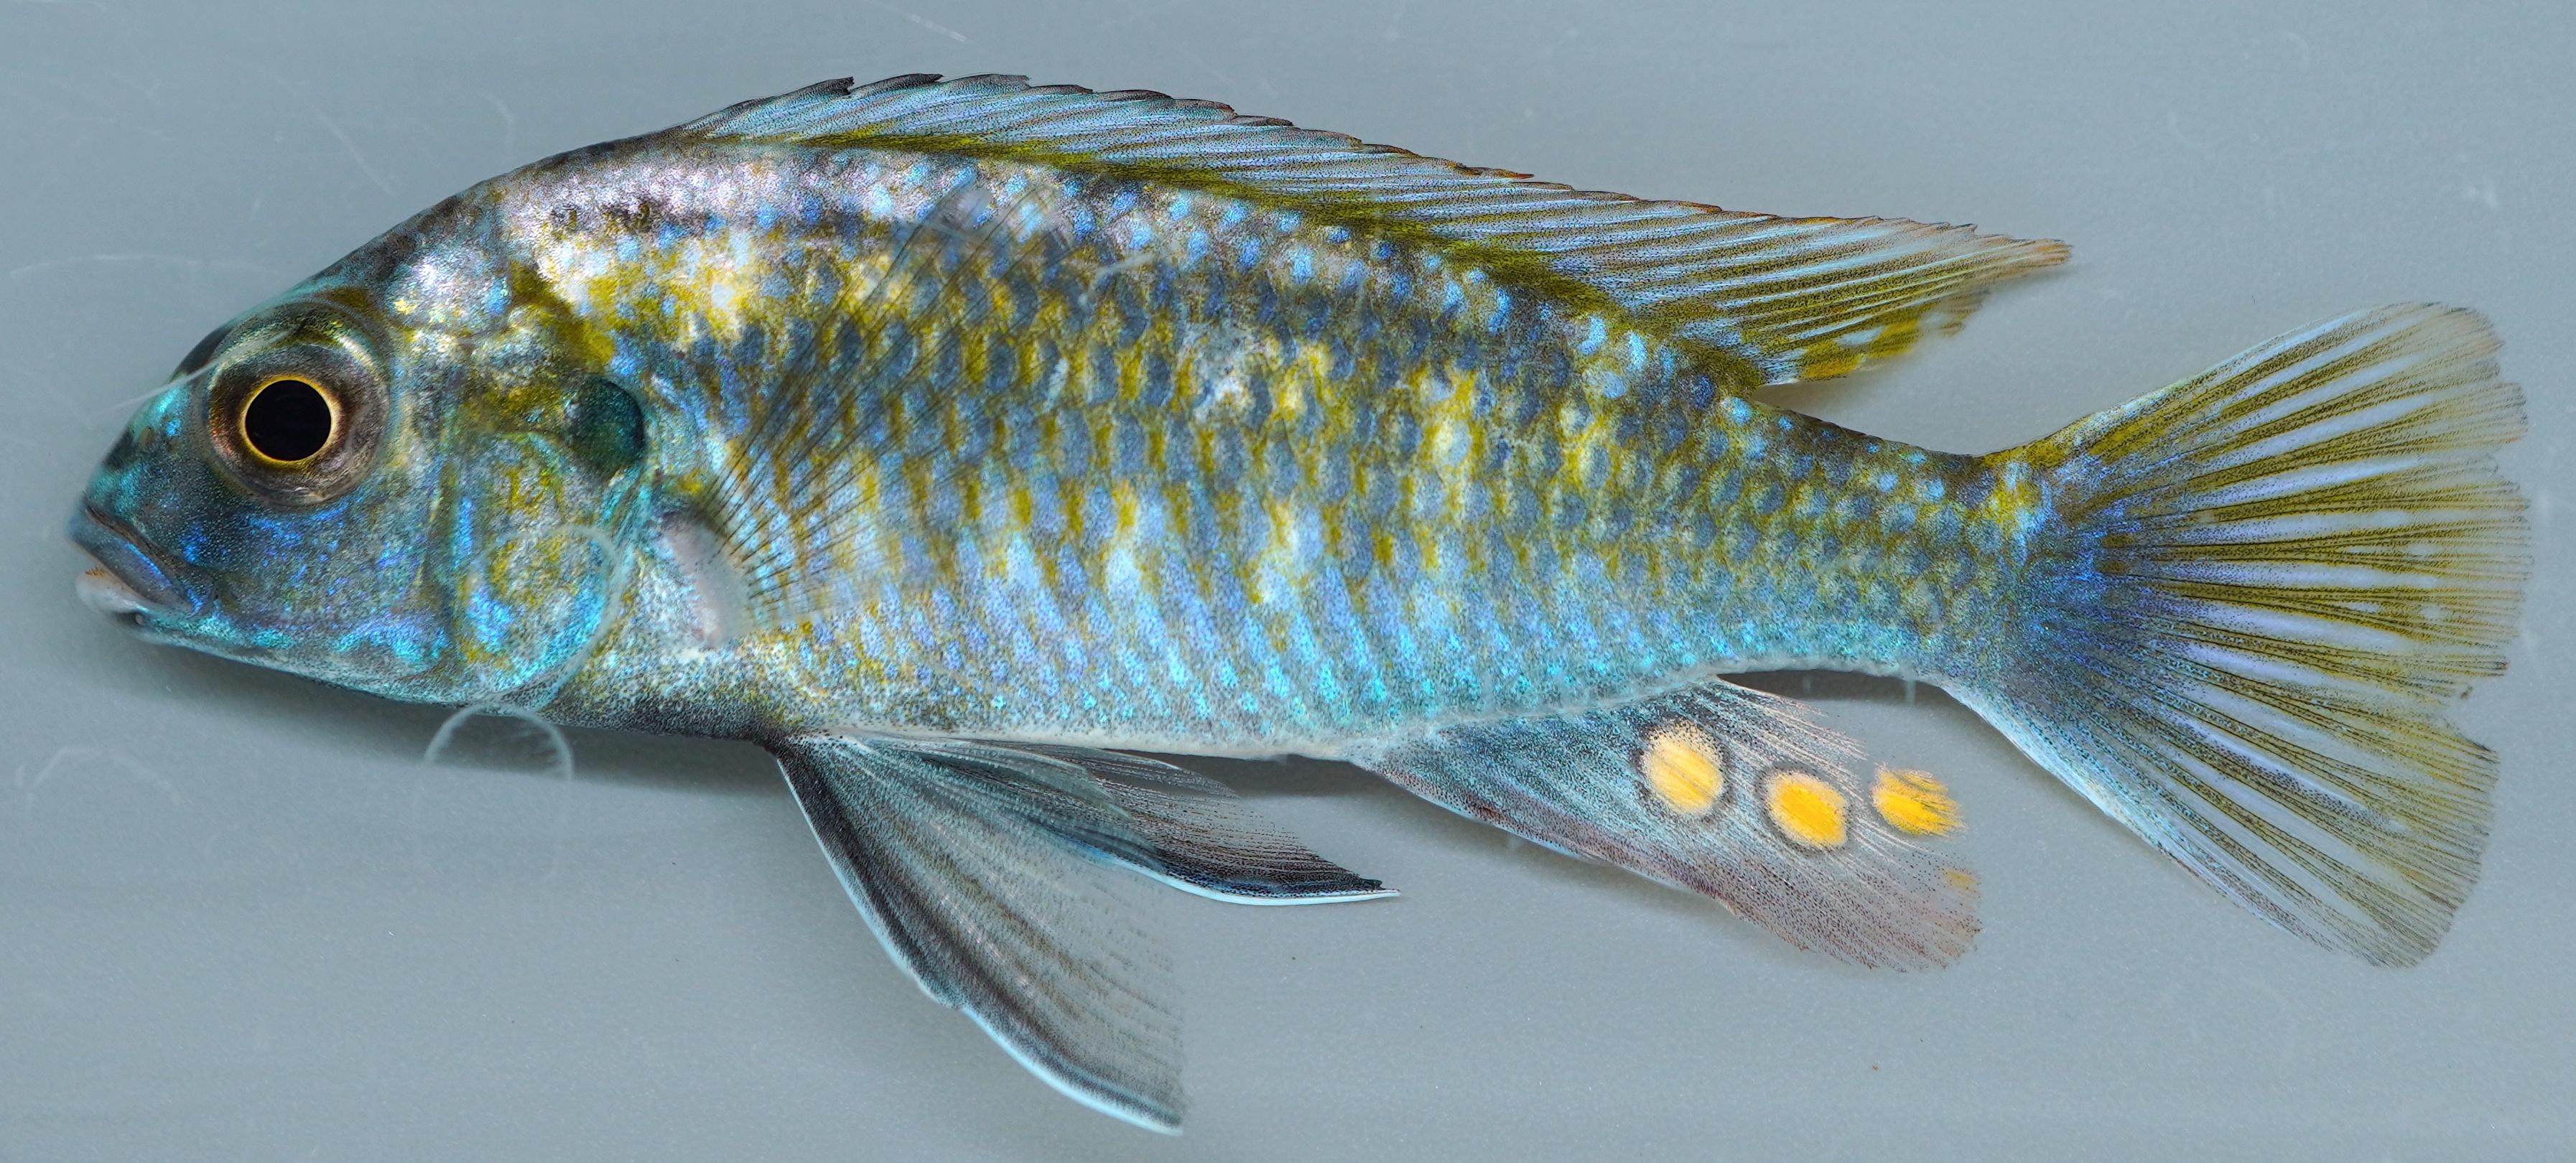 Photo of a Cichlid